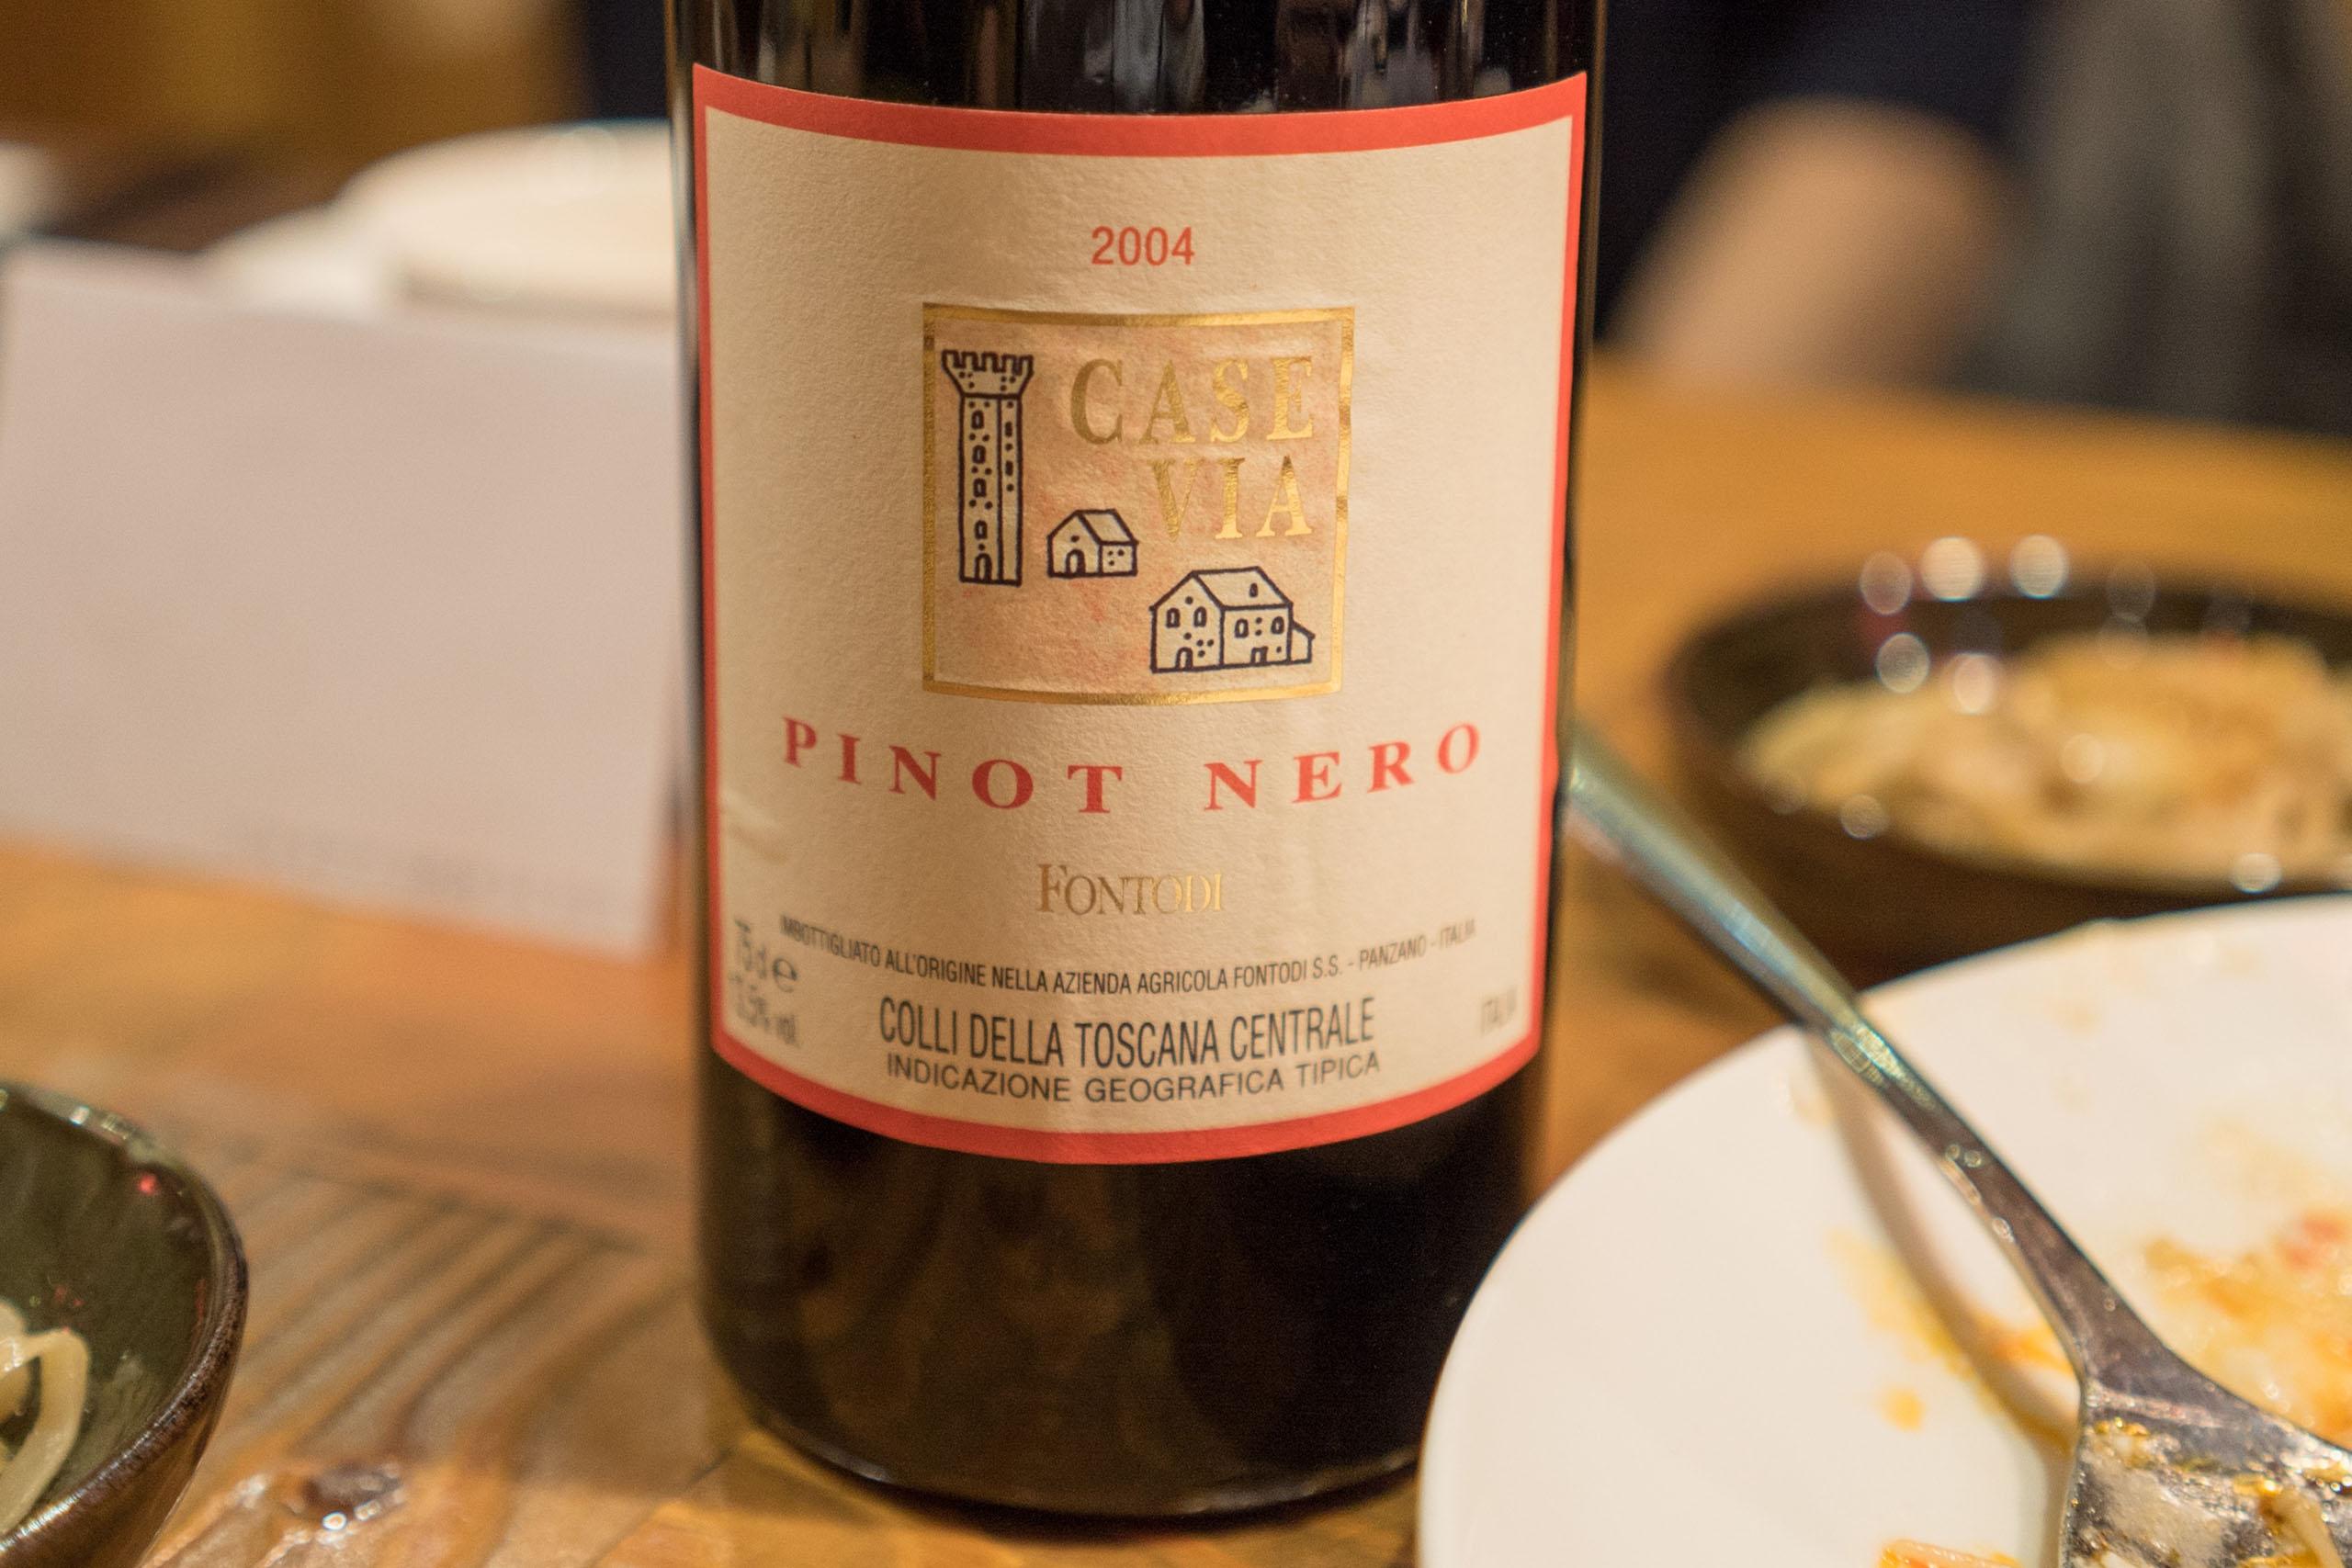 Fontodi Case Via Pinot Nero 2004